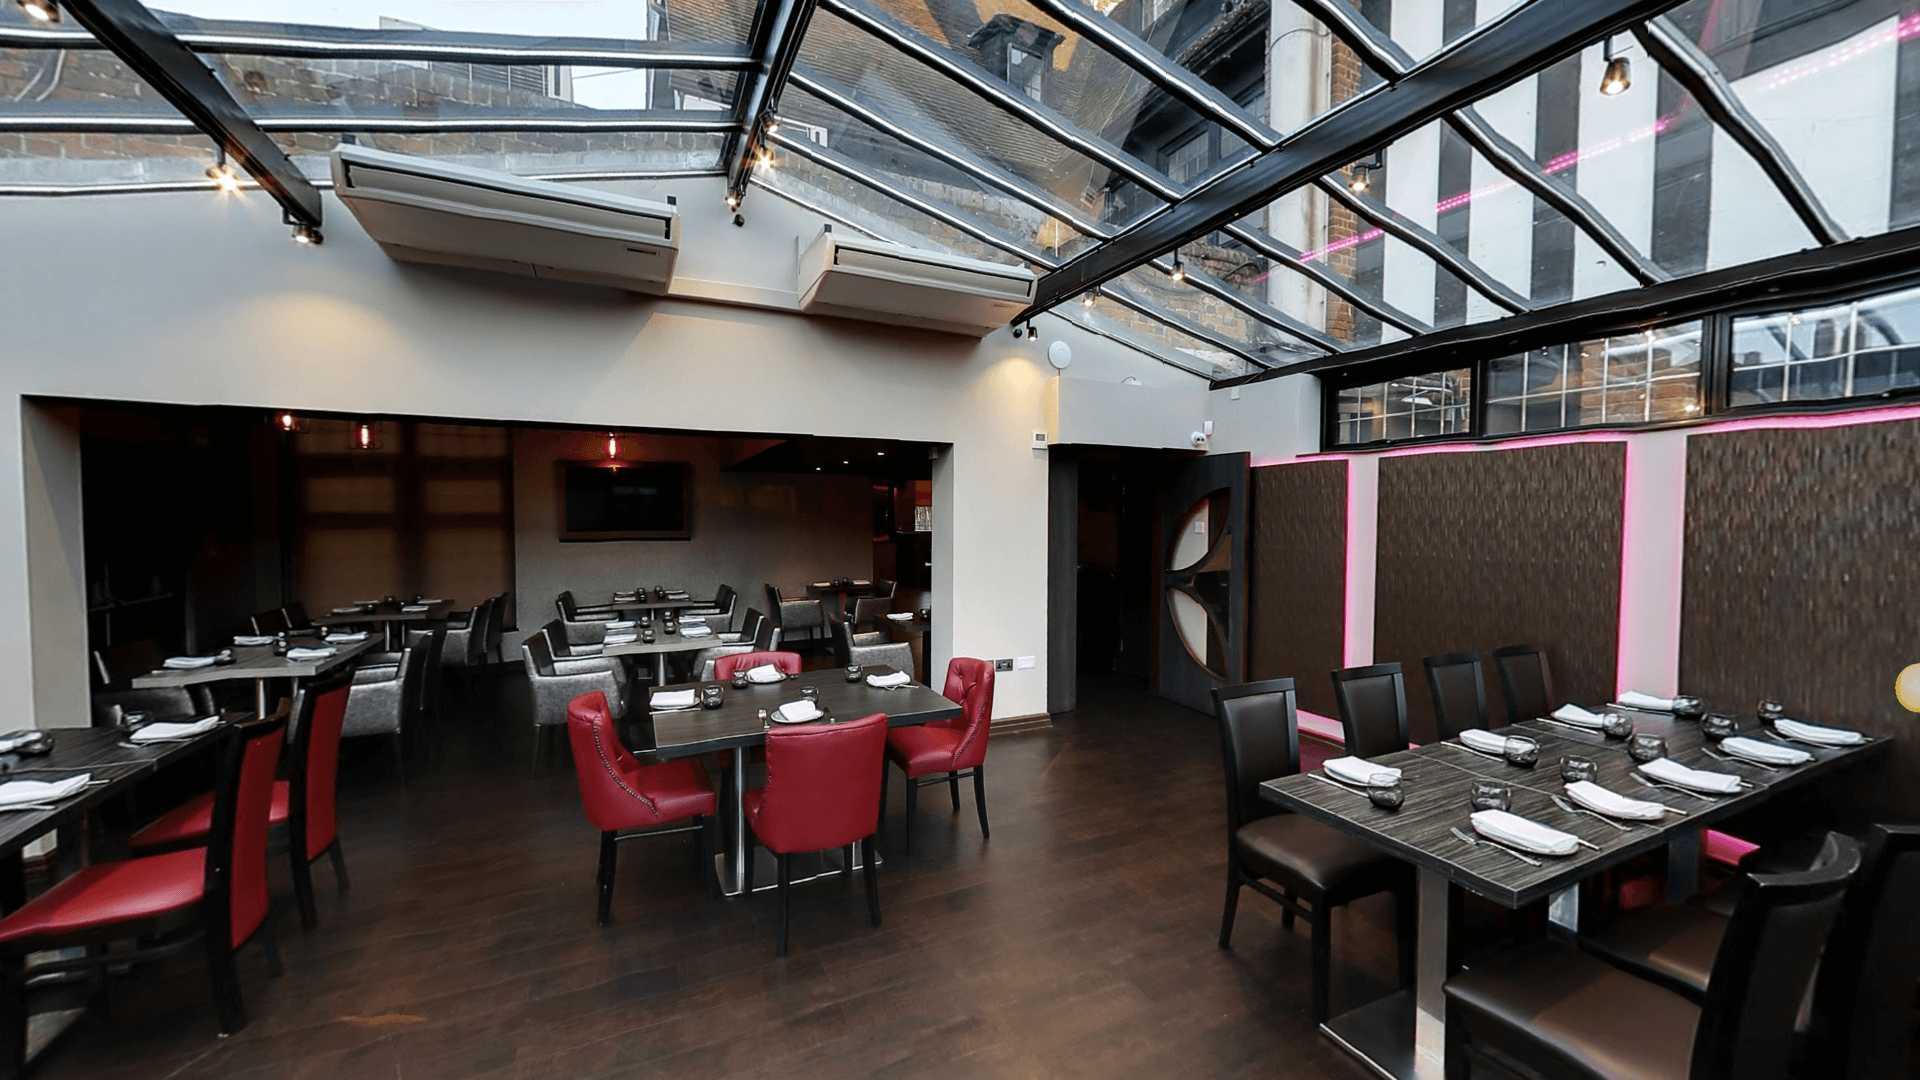 Copy of the empty Venue5 lounge